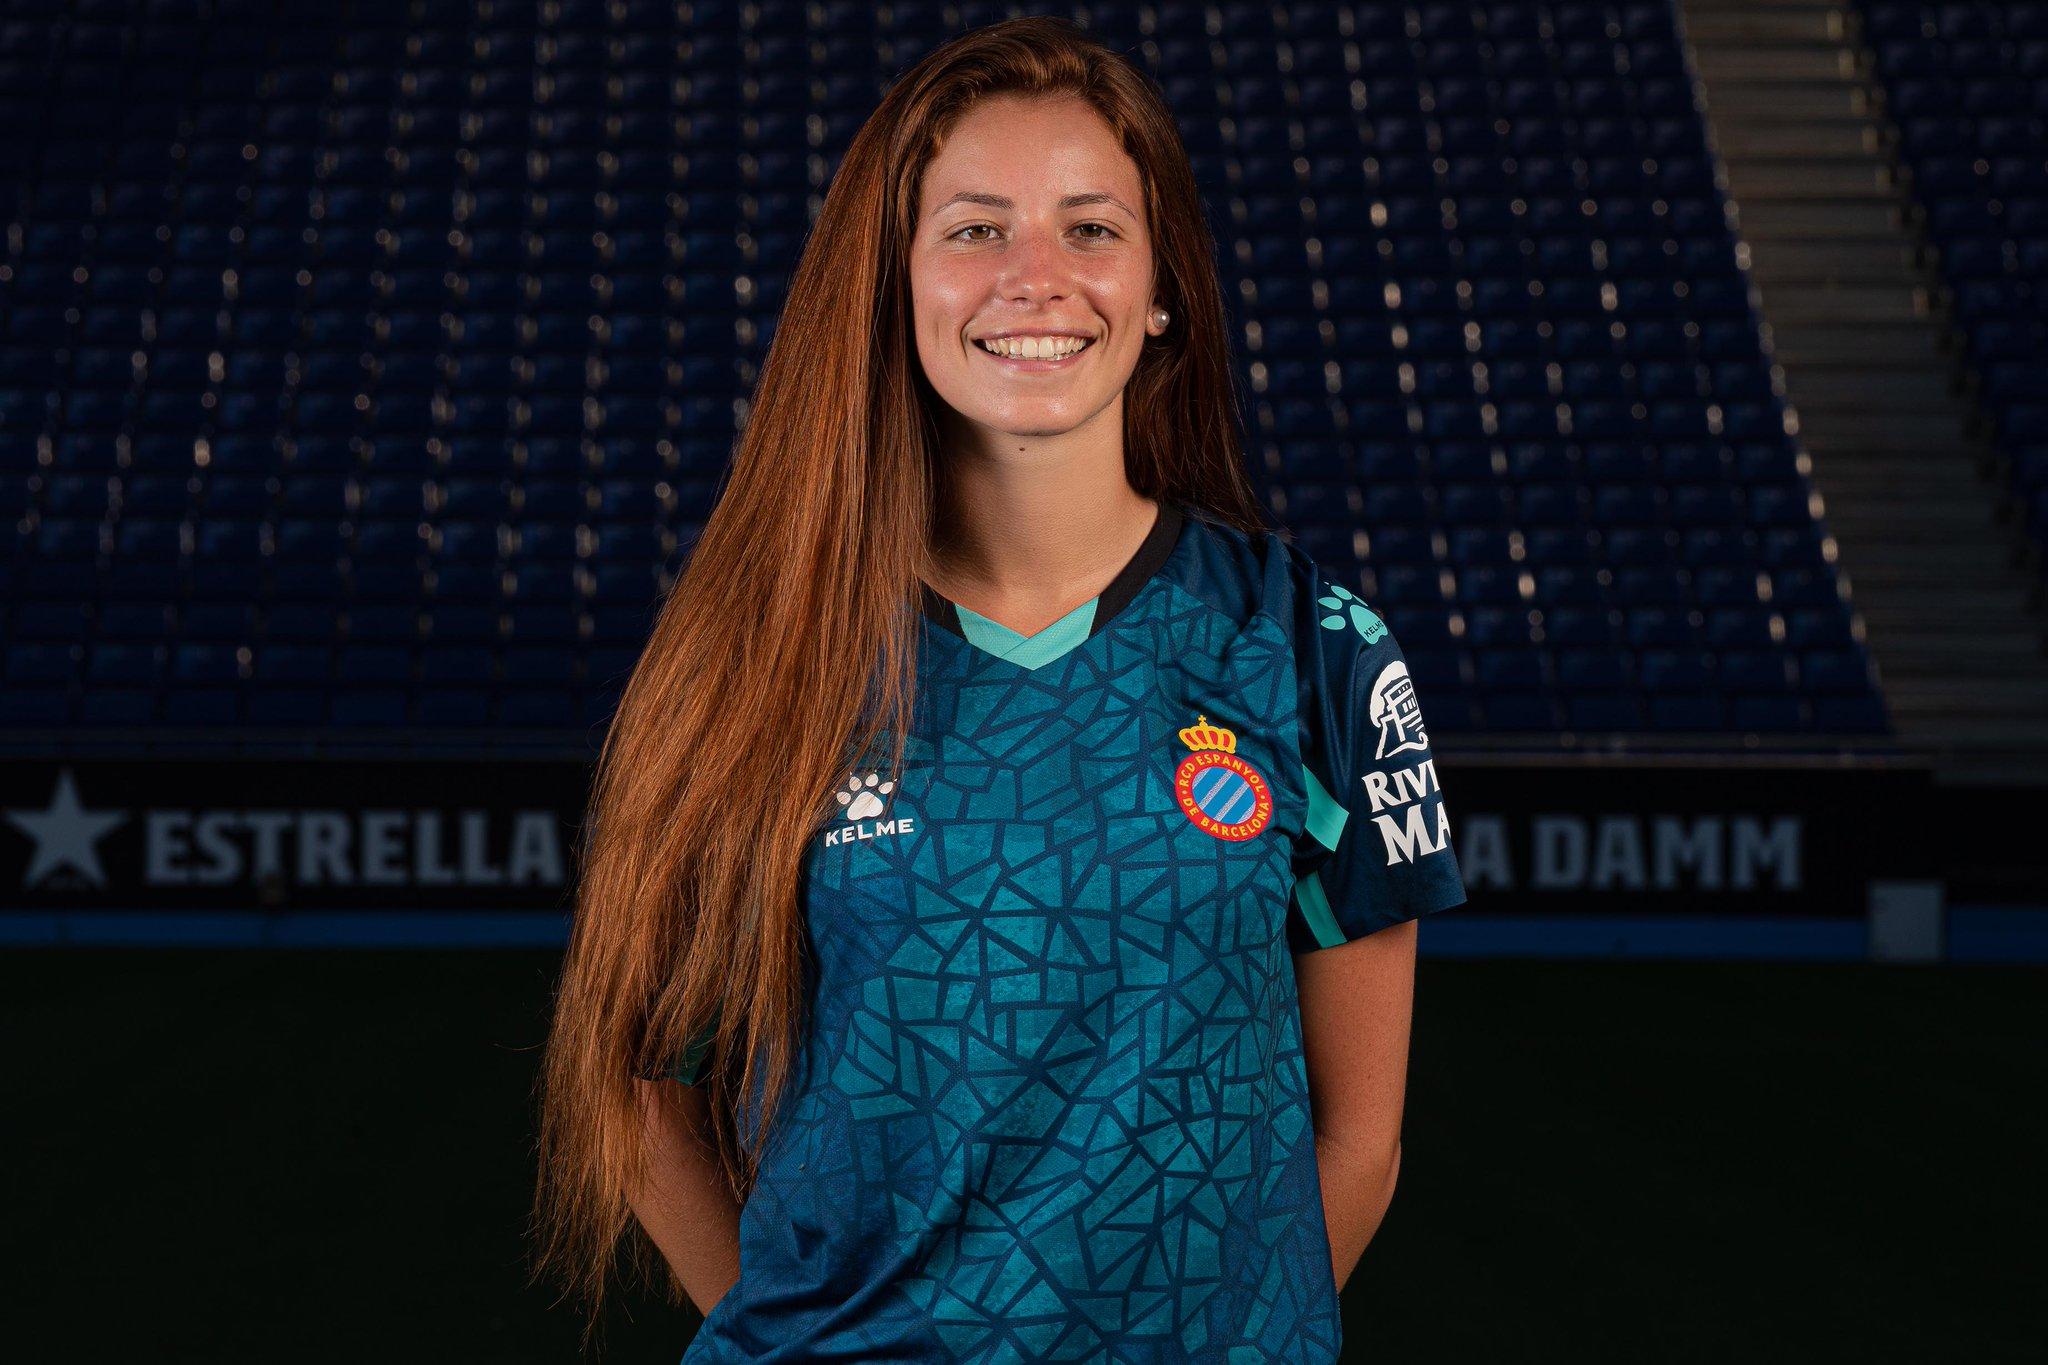 Espanyol 2020-21 Kelme Away Kit   20/21 Kits   Football shirt blog